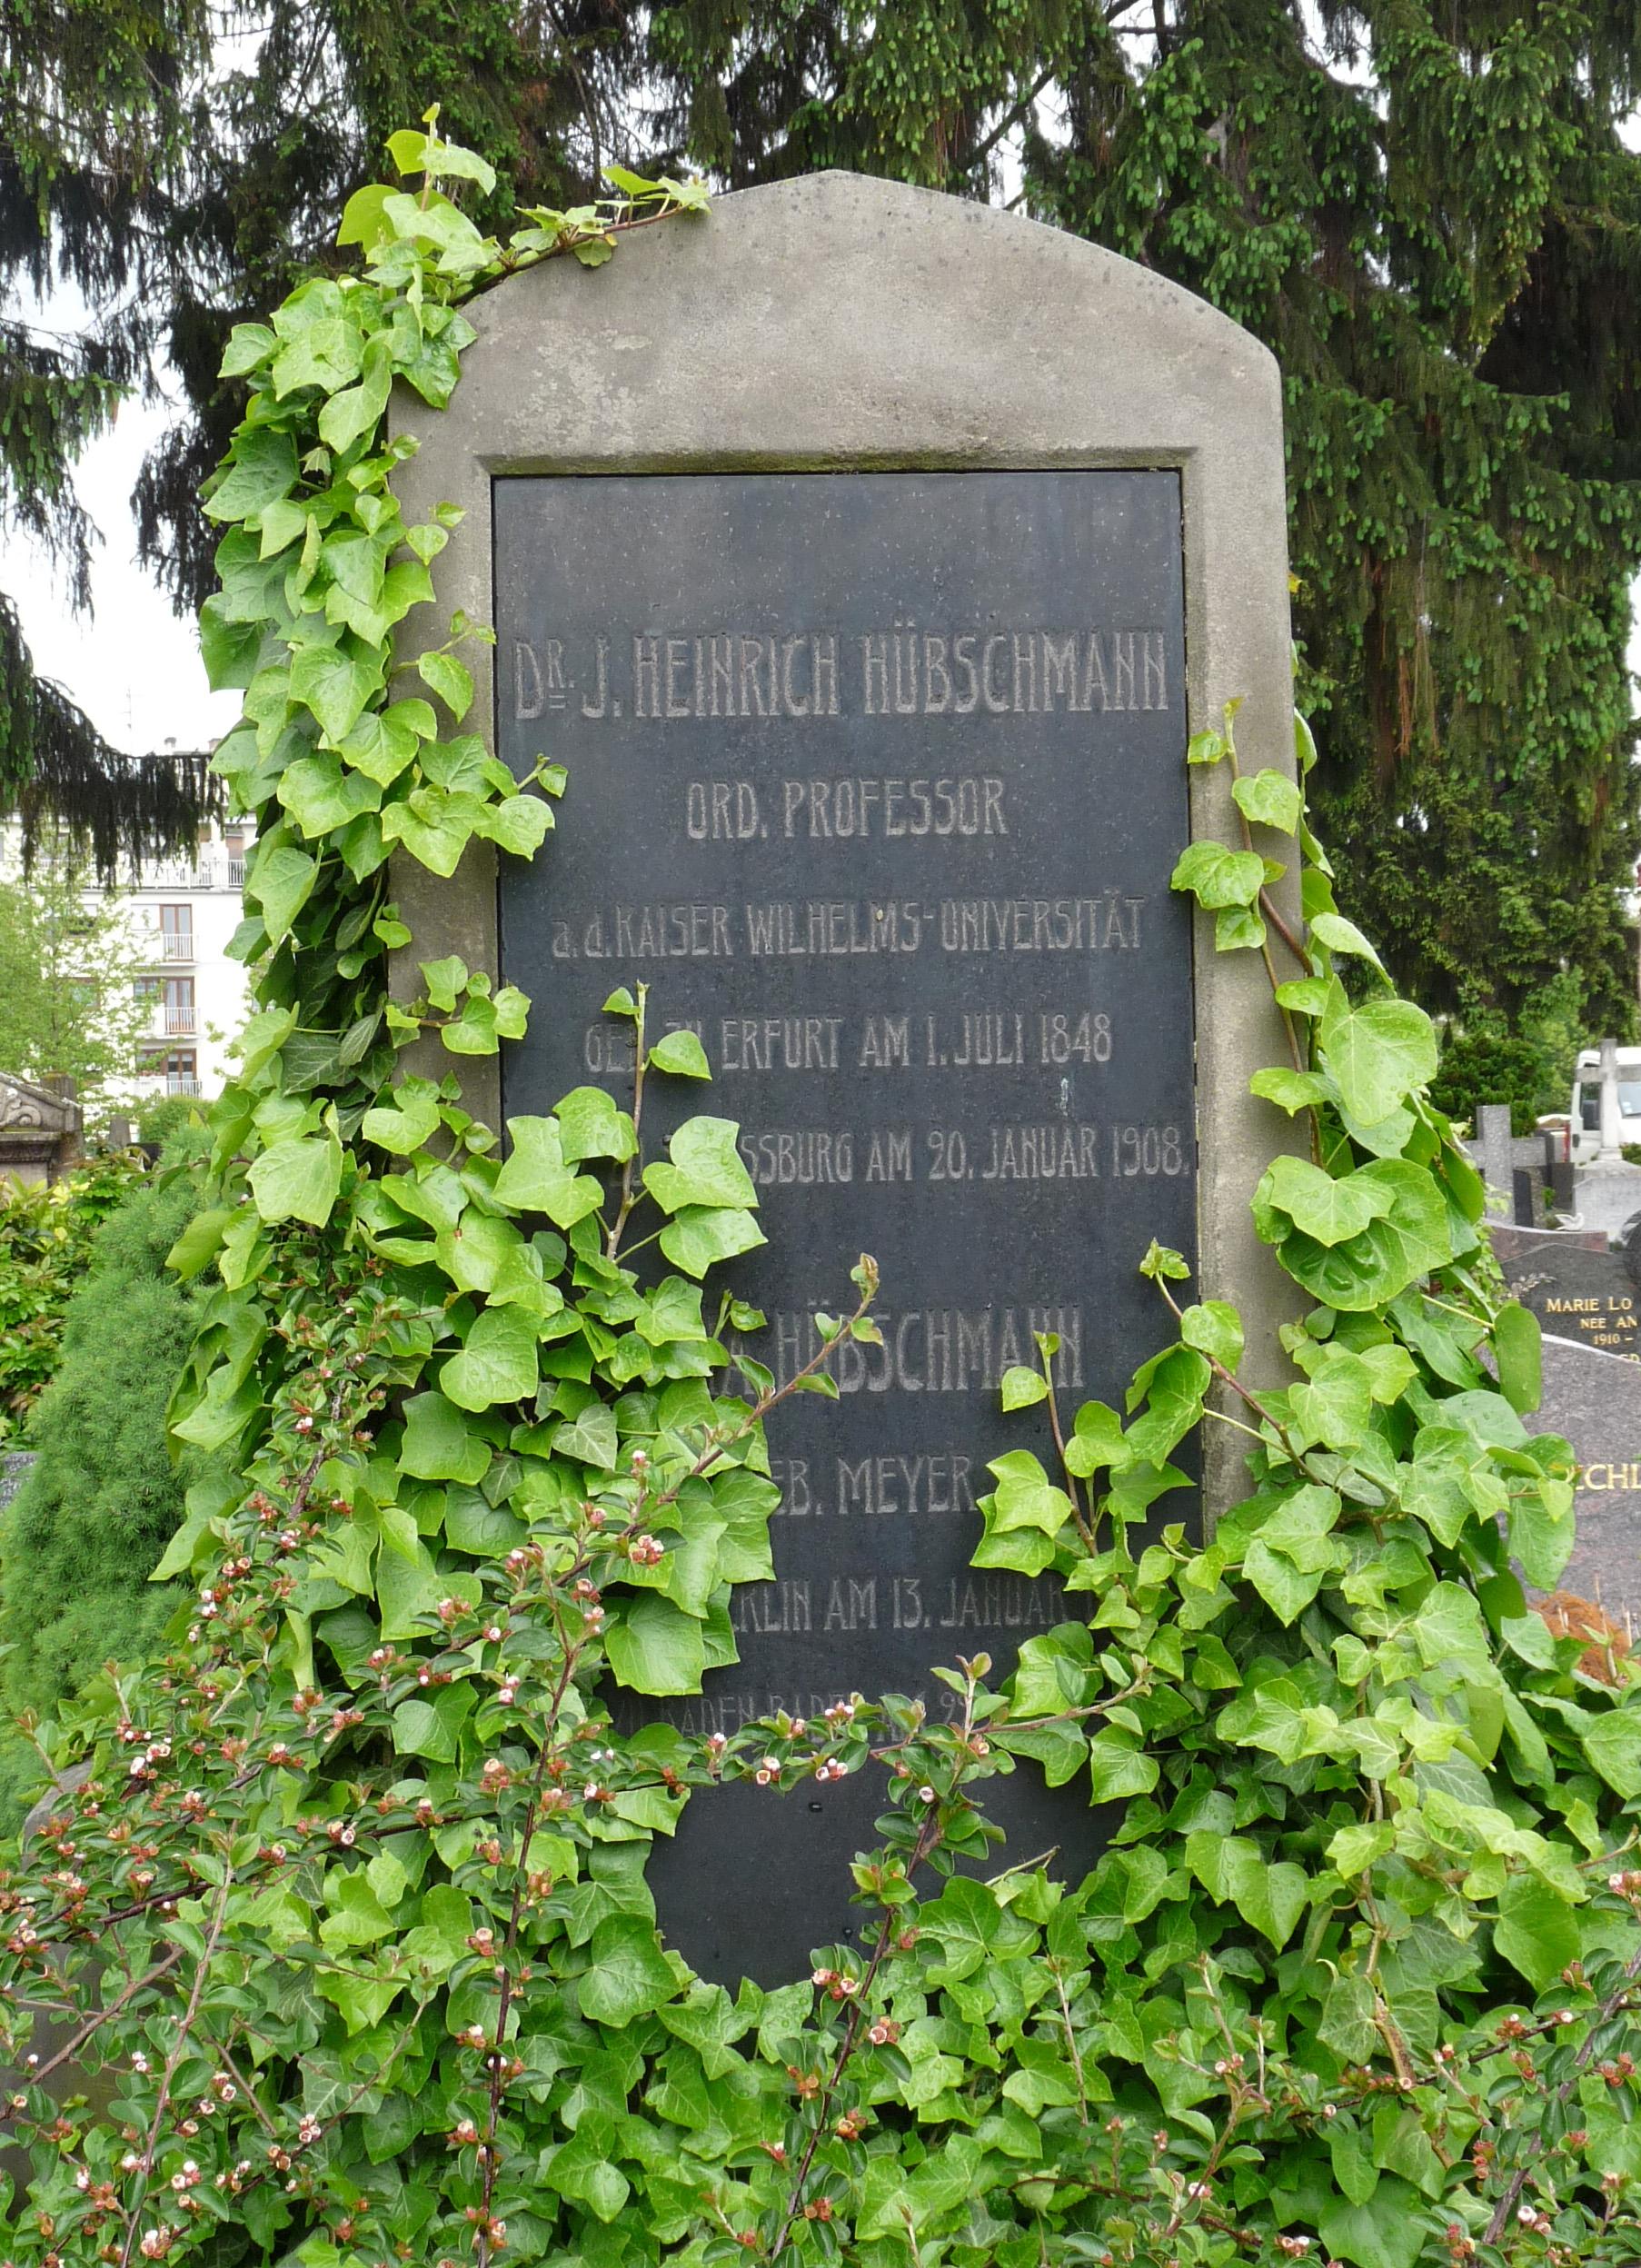 https://upload.wikimedia.org/wikipedia/commons/d/db/Heinrich_Hübschmann-Strasbourg.jpg